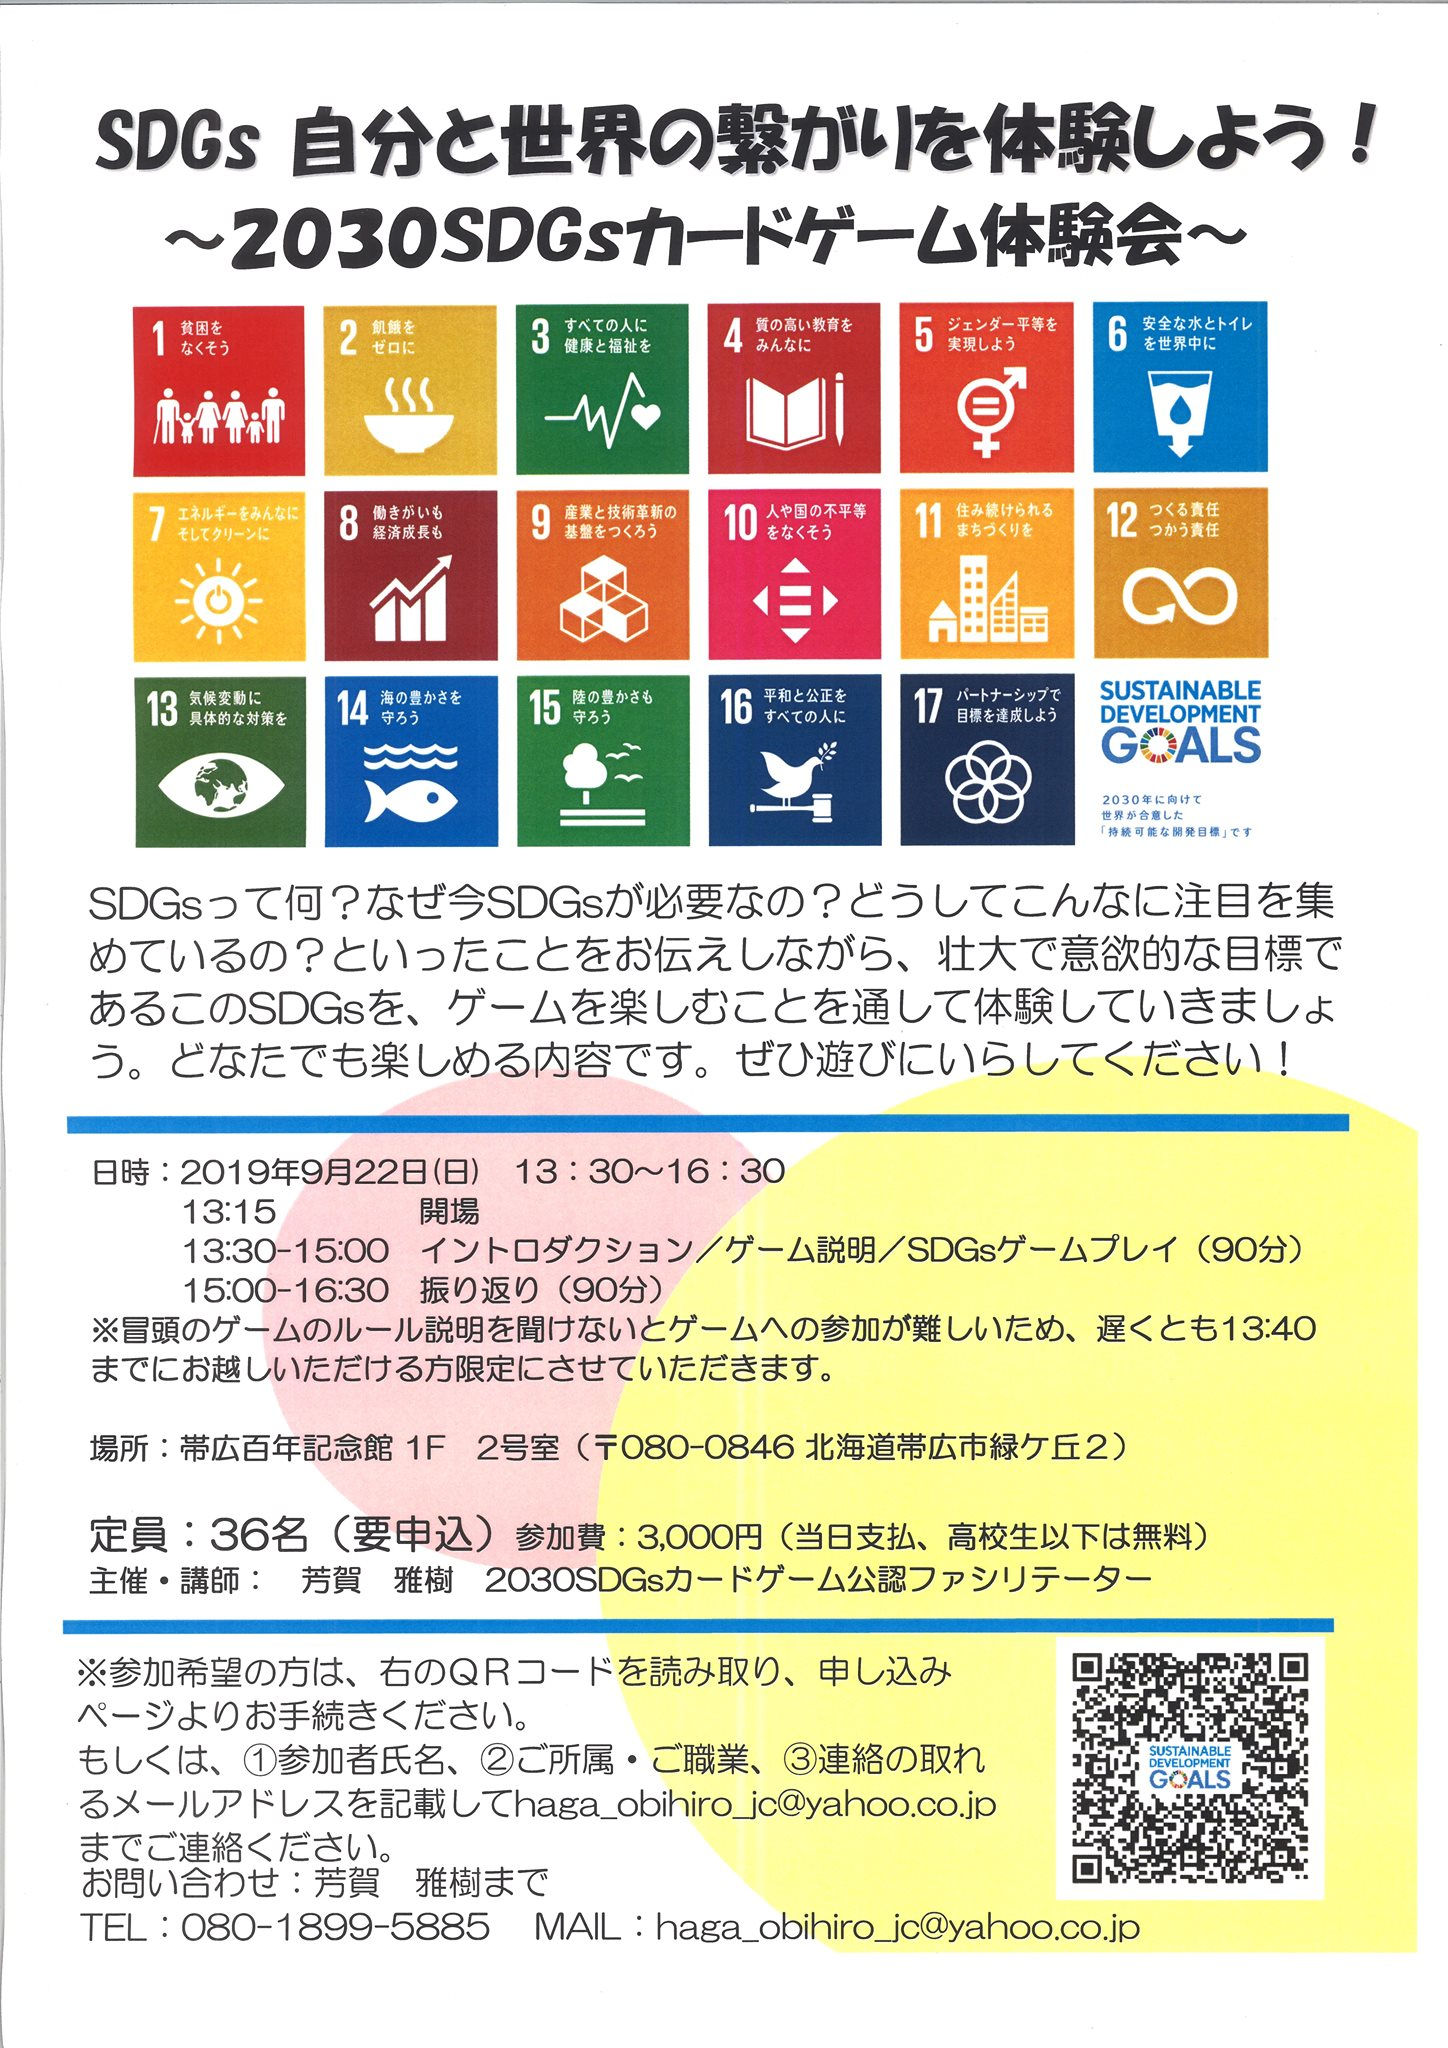 SDGs自分と世界の繋がりを体験しよう!~2030SDGsカードゲーム体験会~